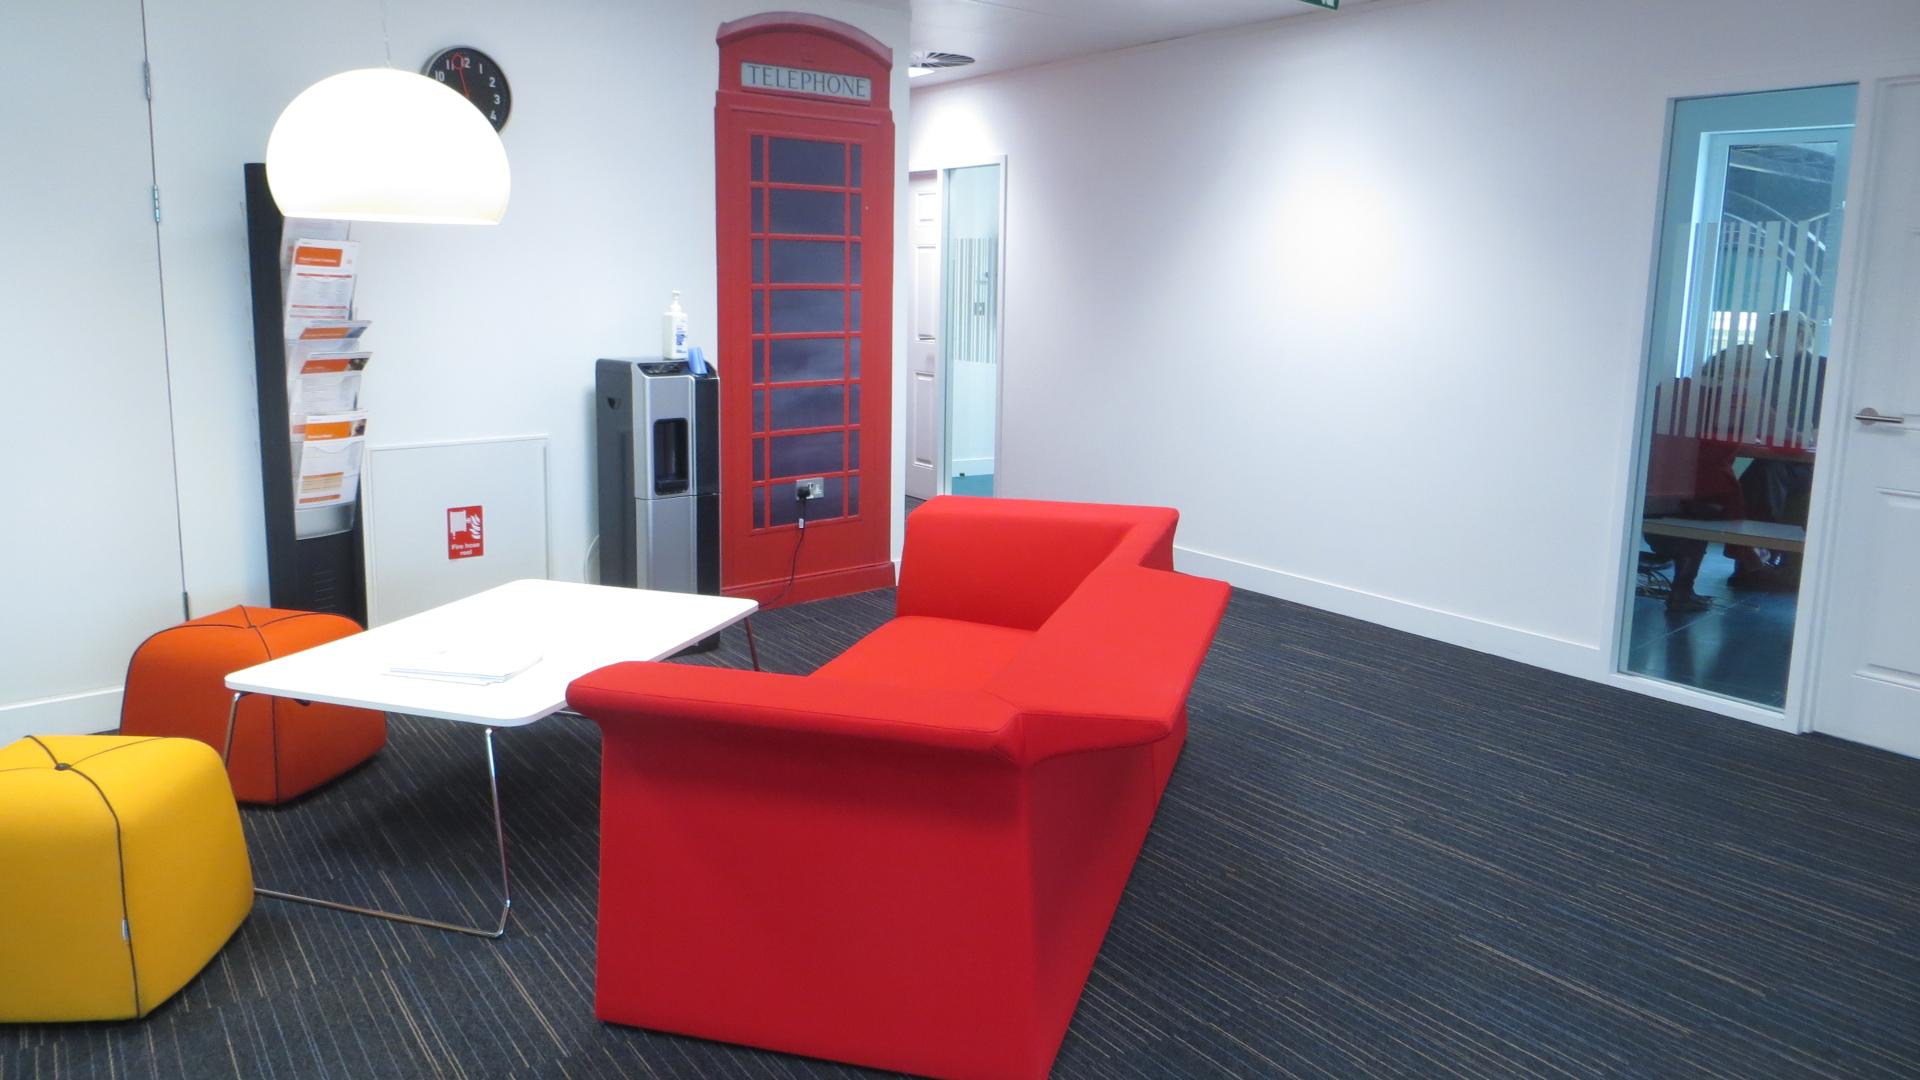 FileBlackbaud Europe offices London 13456743904jpg 1920x1080